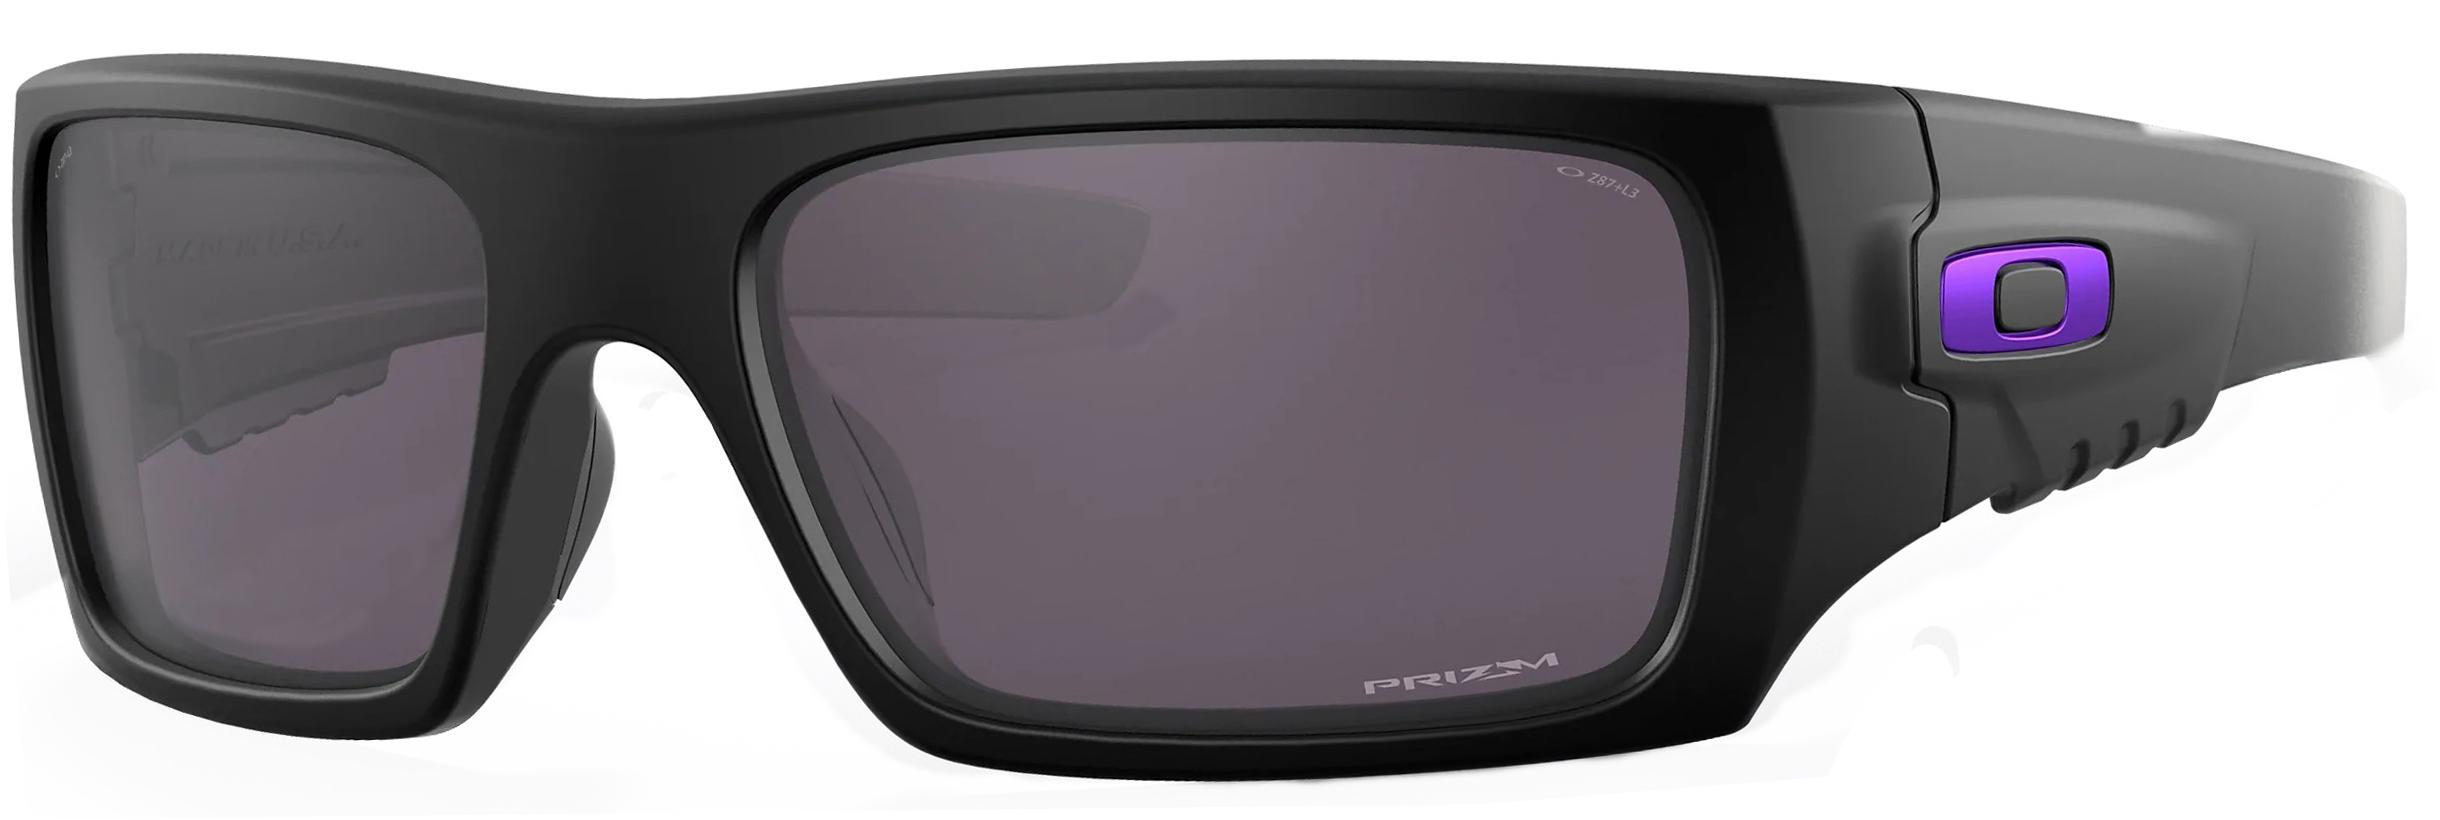 Oakley SI Det Cord Infinite Hero in Matte Black Frame with Prizm Grey Lenses, Angled to the Side Left